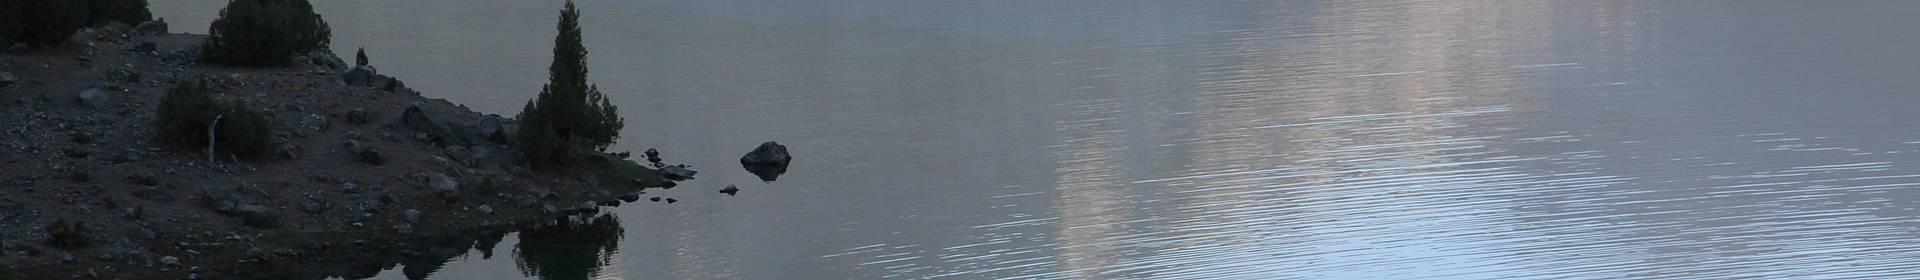 lacs Koulikalon